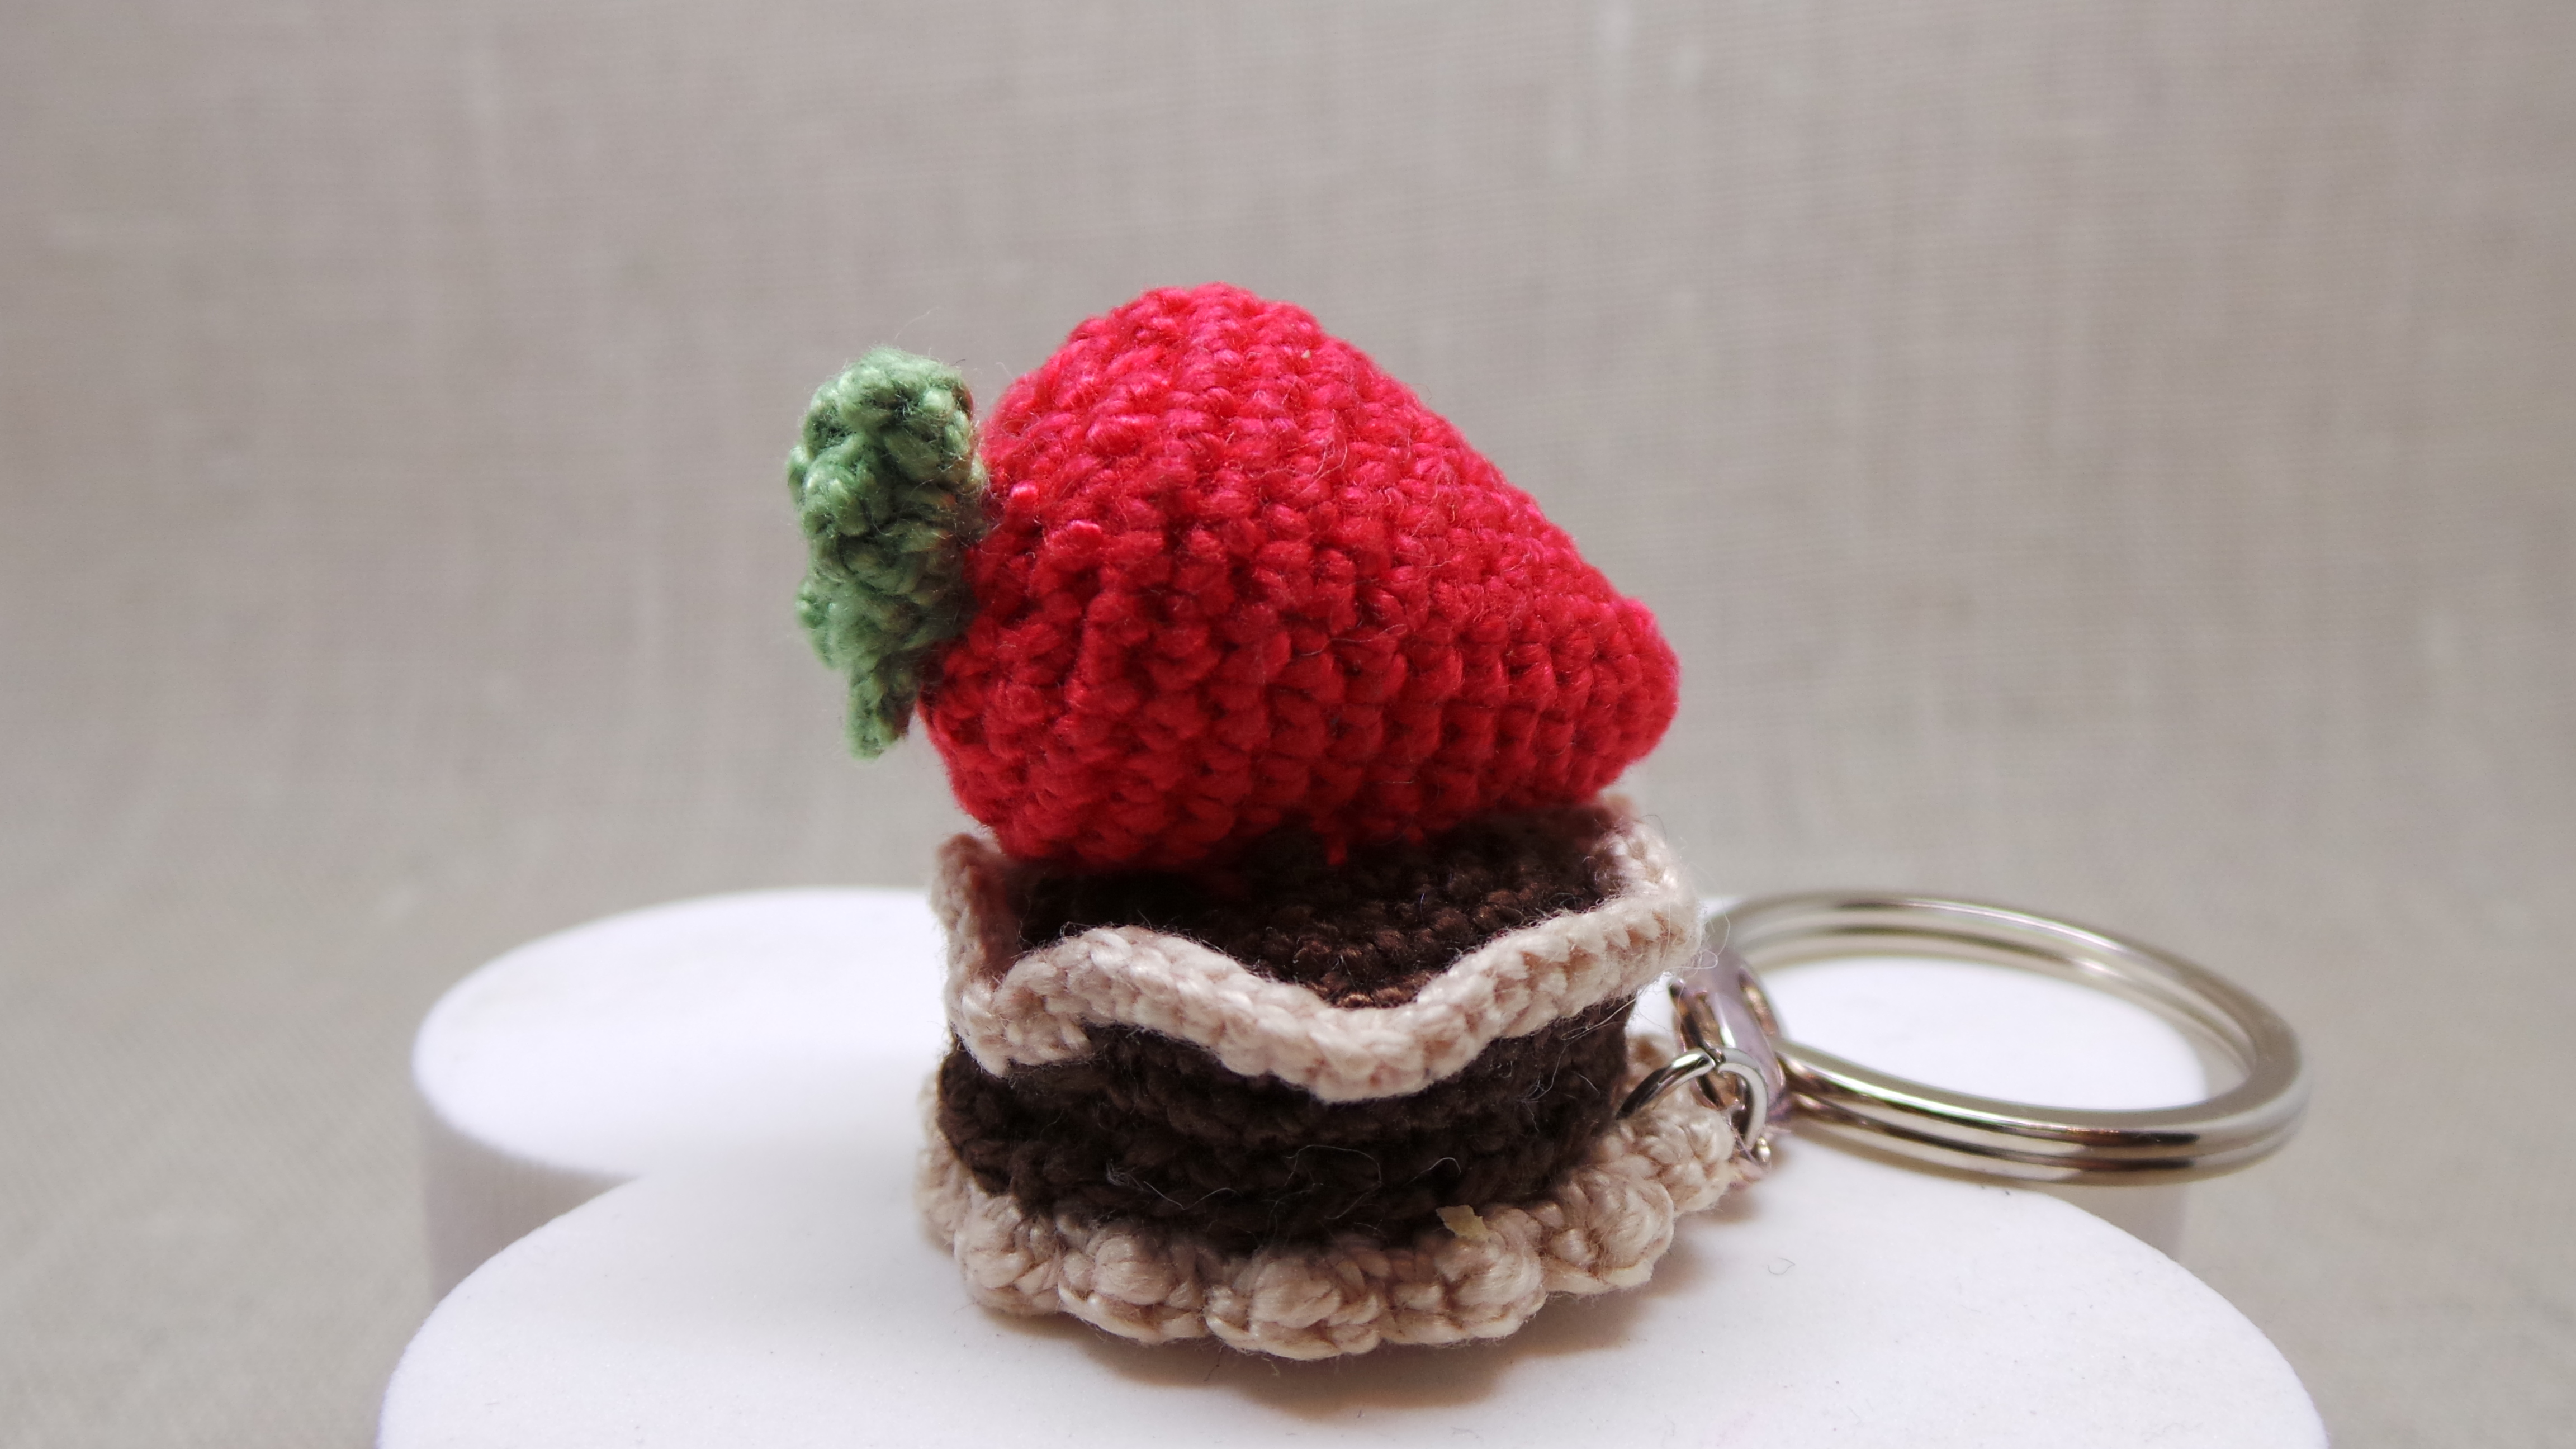 Crochet Strawberry Cake Key Chain